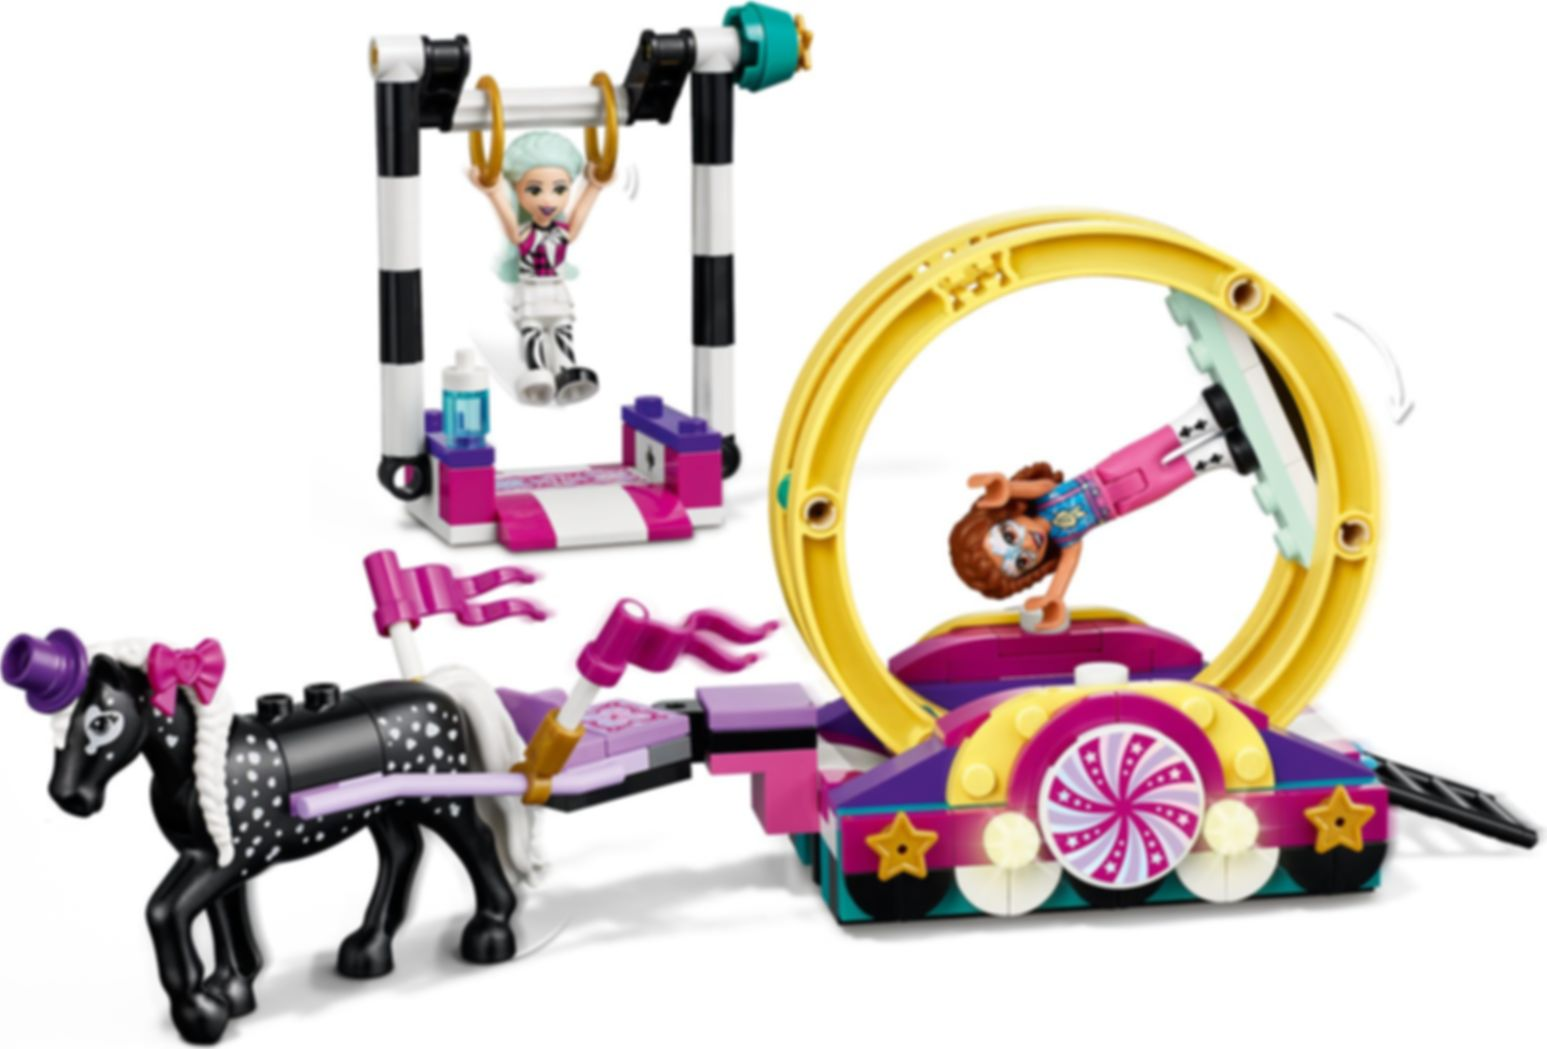 LEGO® Friends Magical Acrobatics gameplay